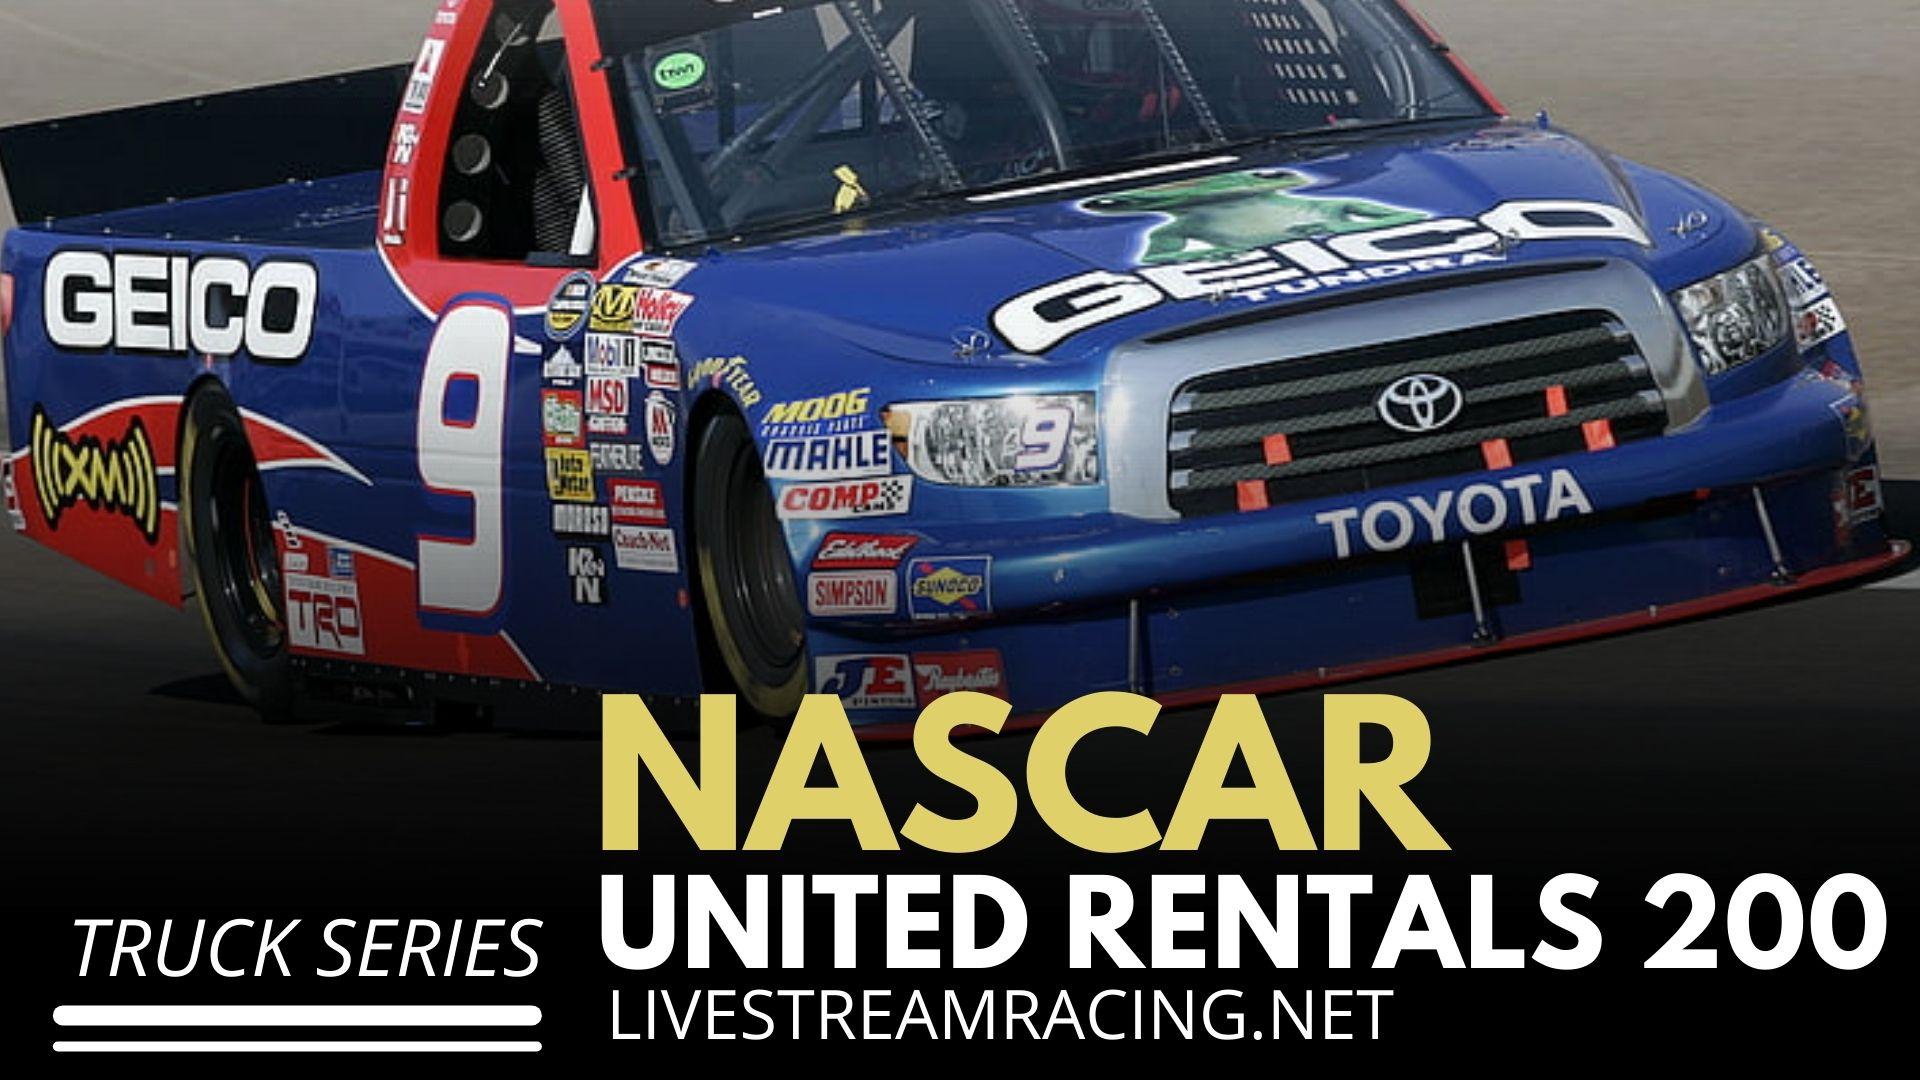 Nascar United Rentals 200 Live Stream 2021 - Truck Series